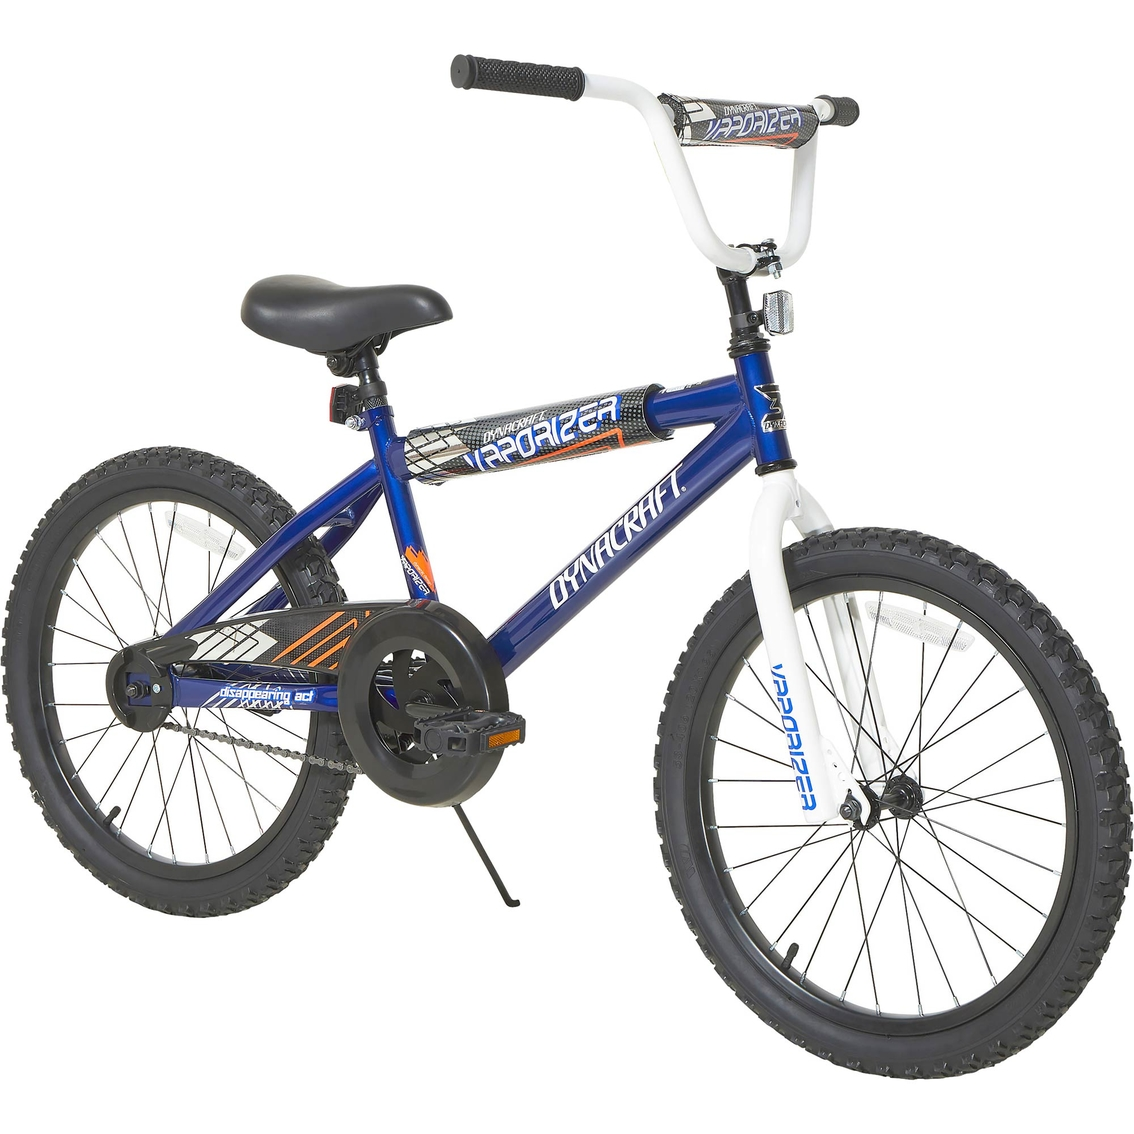 6260ce373c38a Dynacraft Boys 20 In. Vaporizer Sidewalk Bike   Kids' Bikes   Sports ...